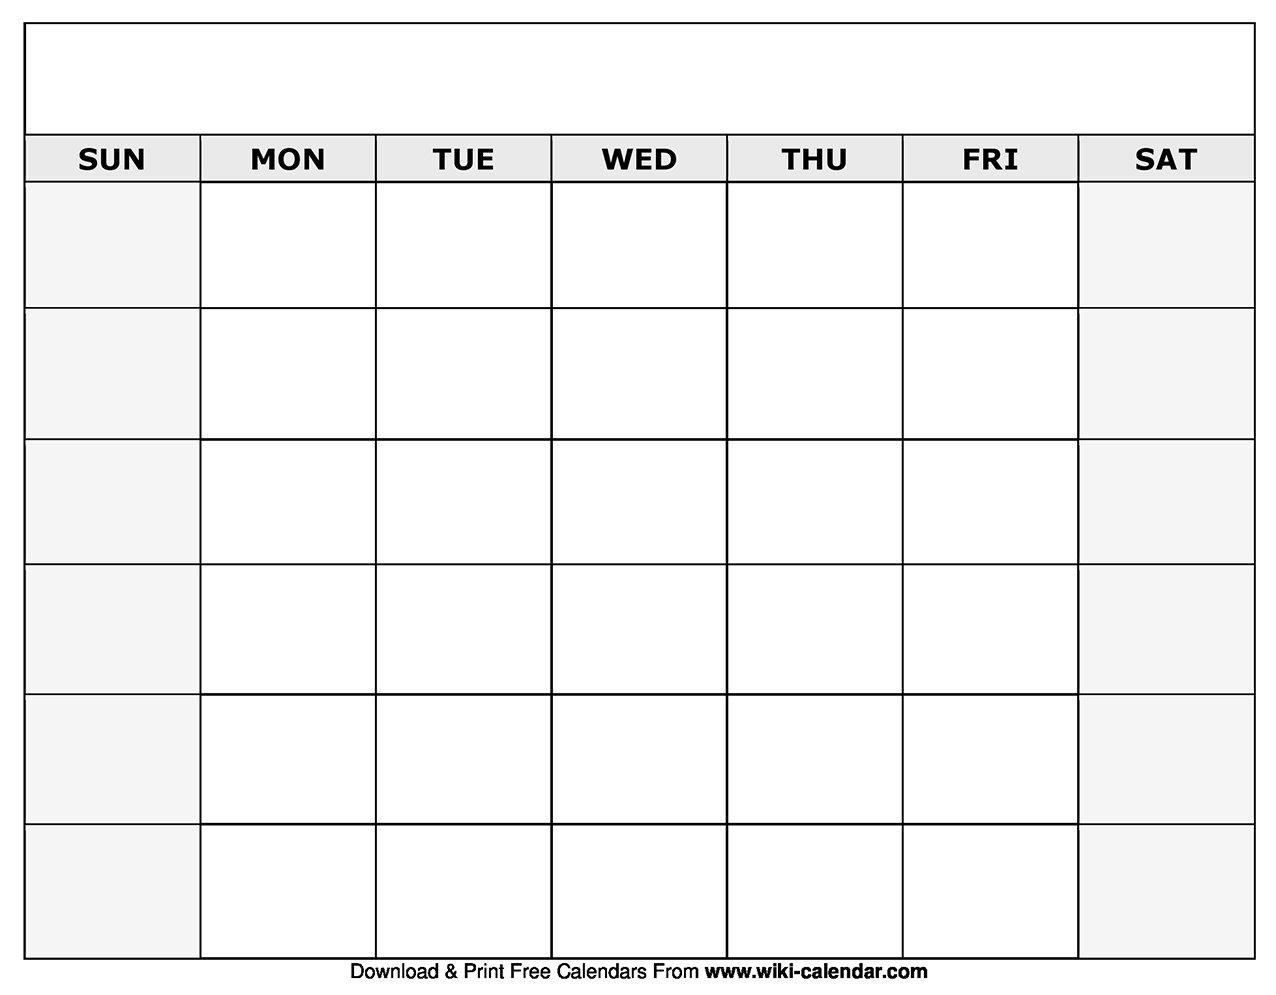 Printable Blank Calendar Templates-Fill In Blank Calendar Fill In Blank Calendar Templates